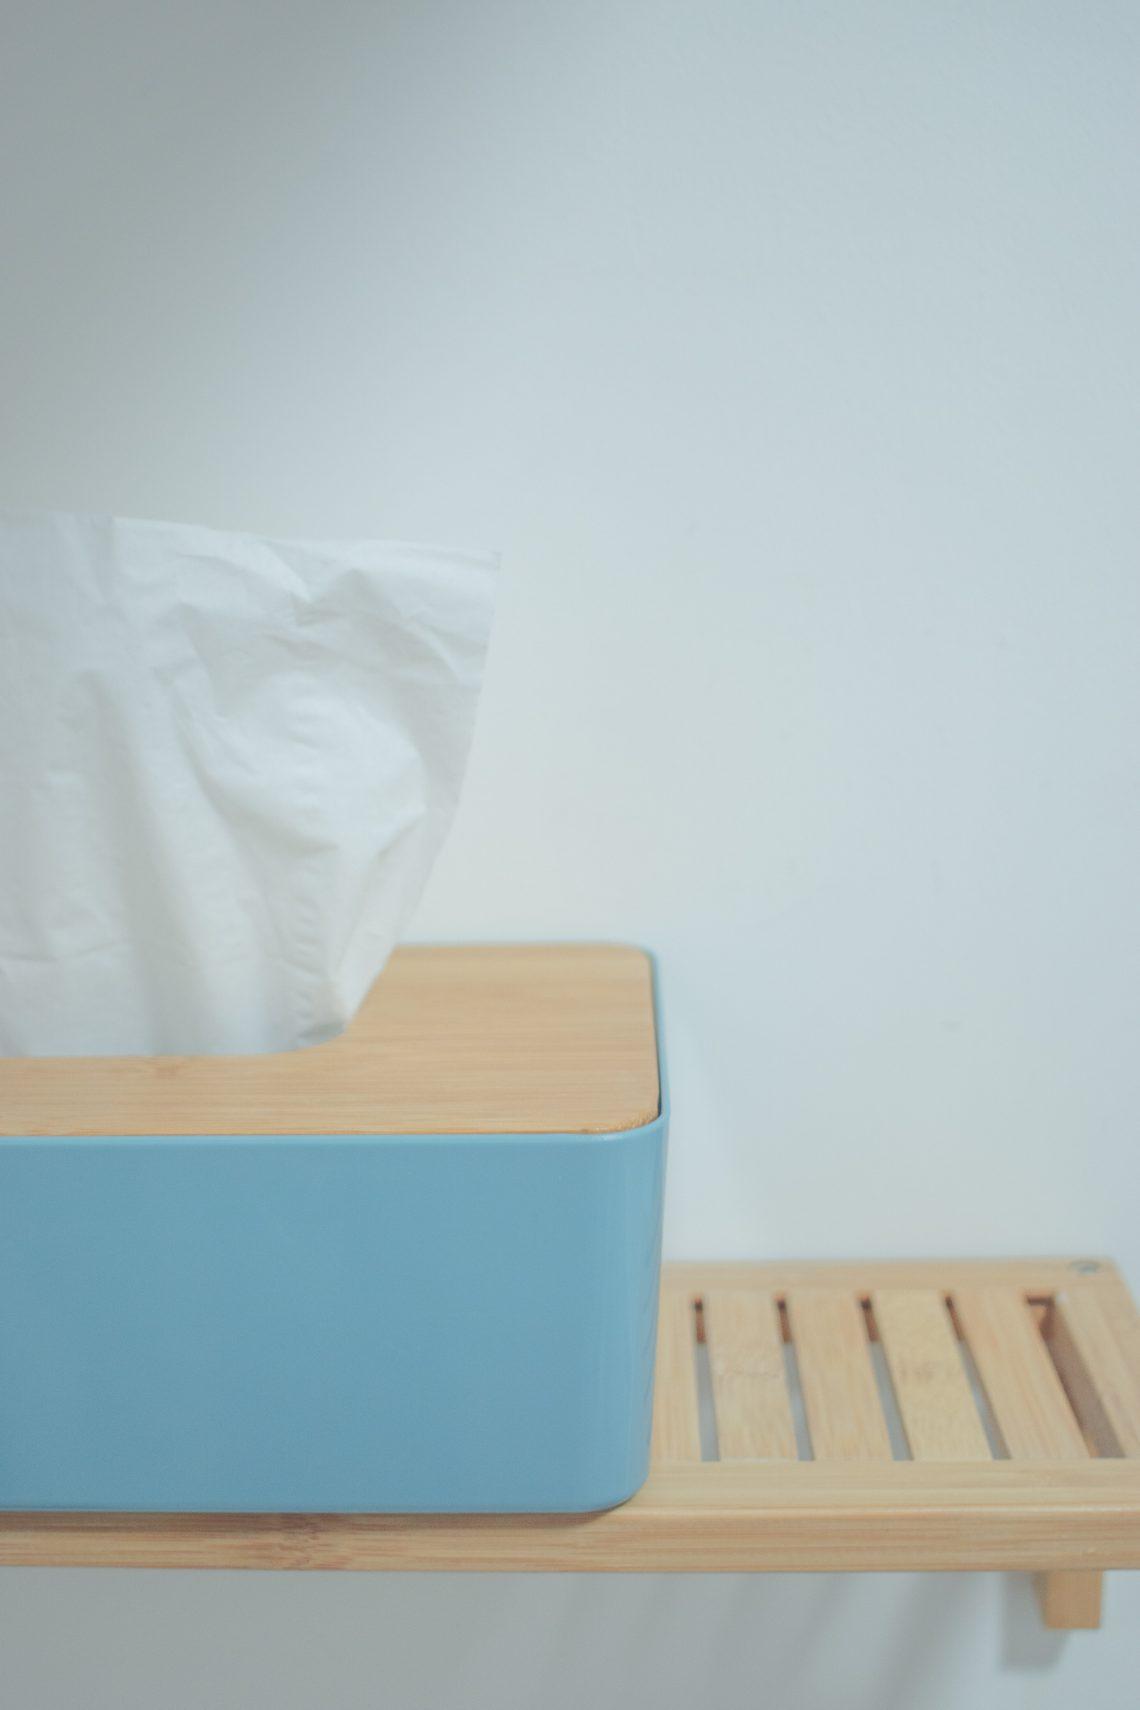 white tissue paper on blue plastic trash bin